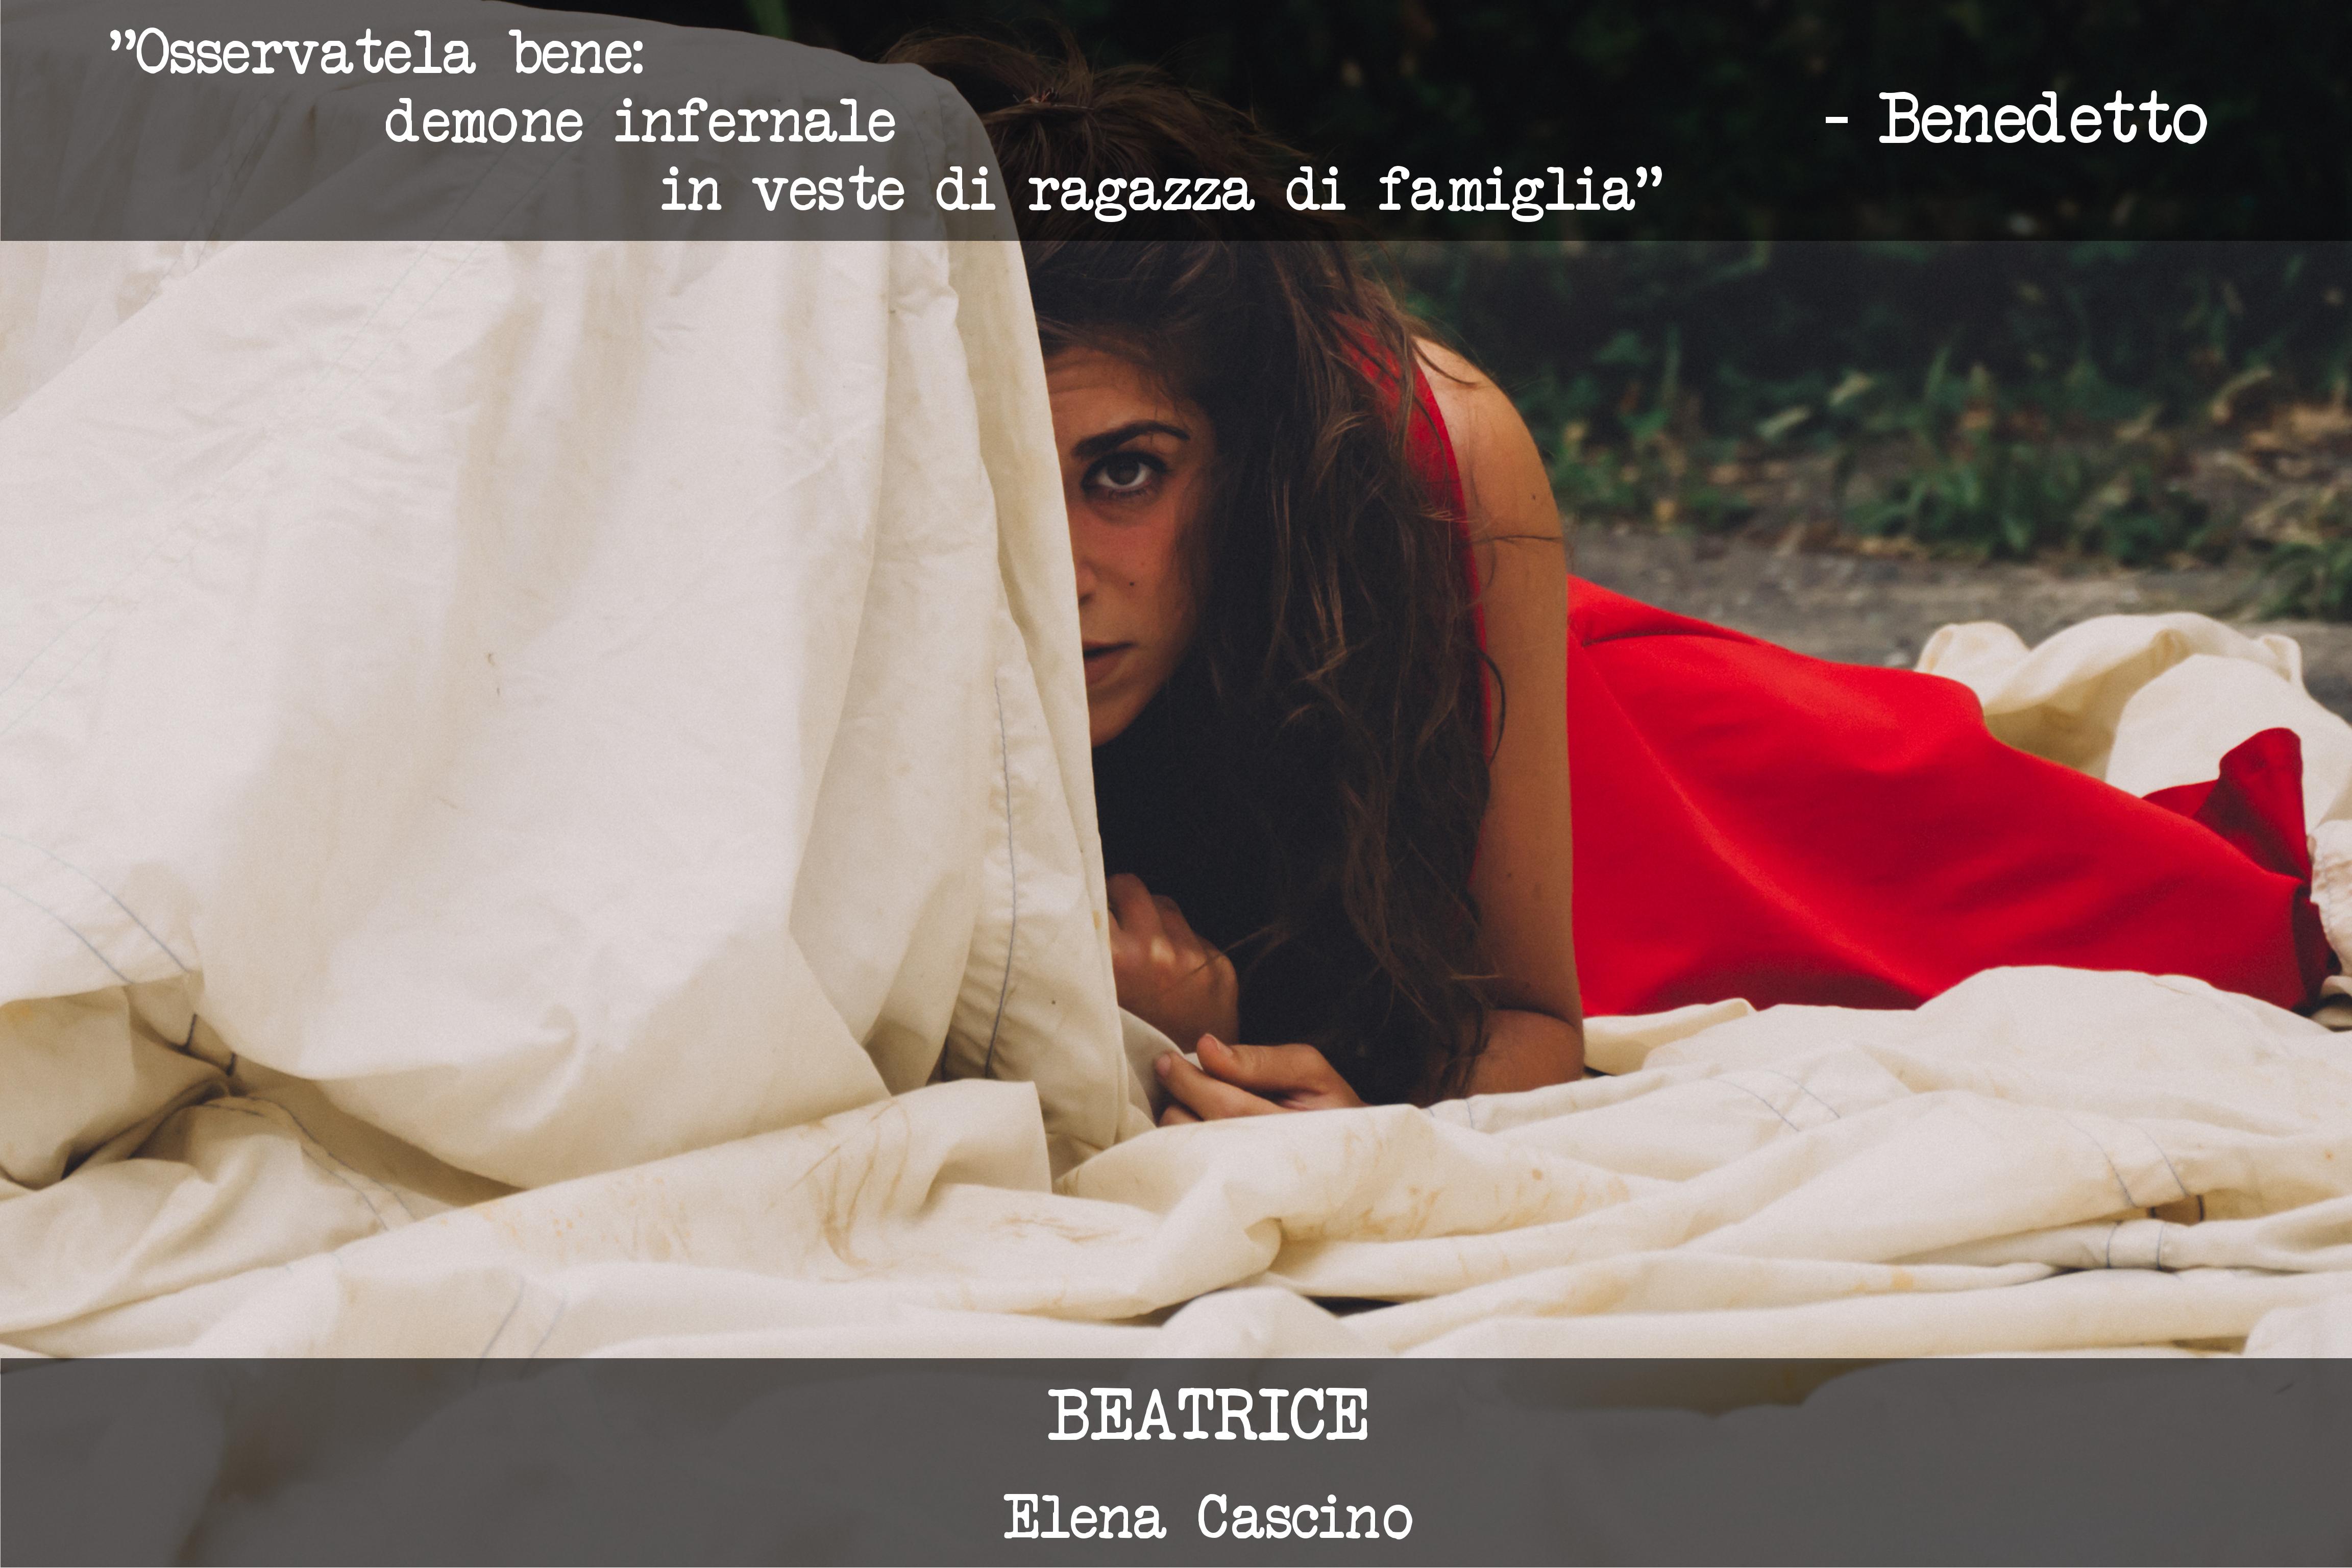 BEATRICE - Elena Cascino